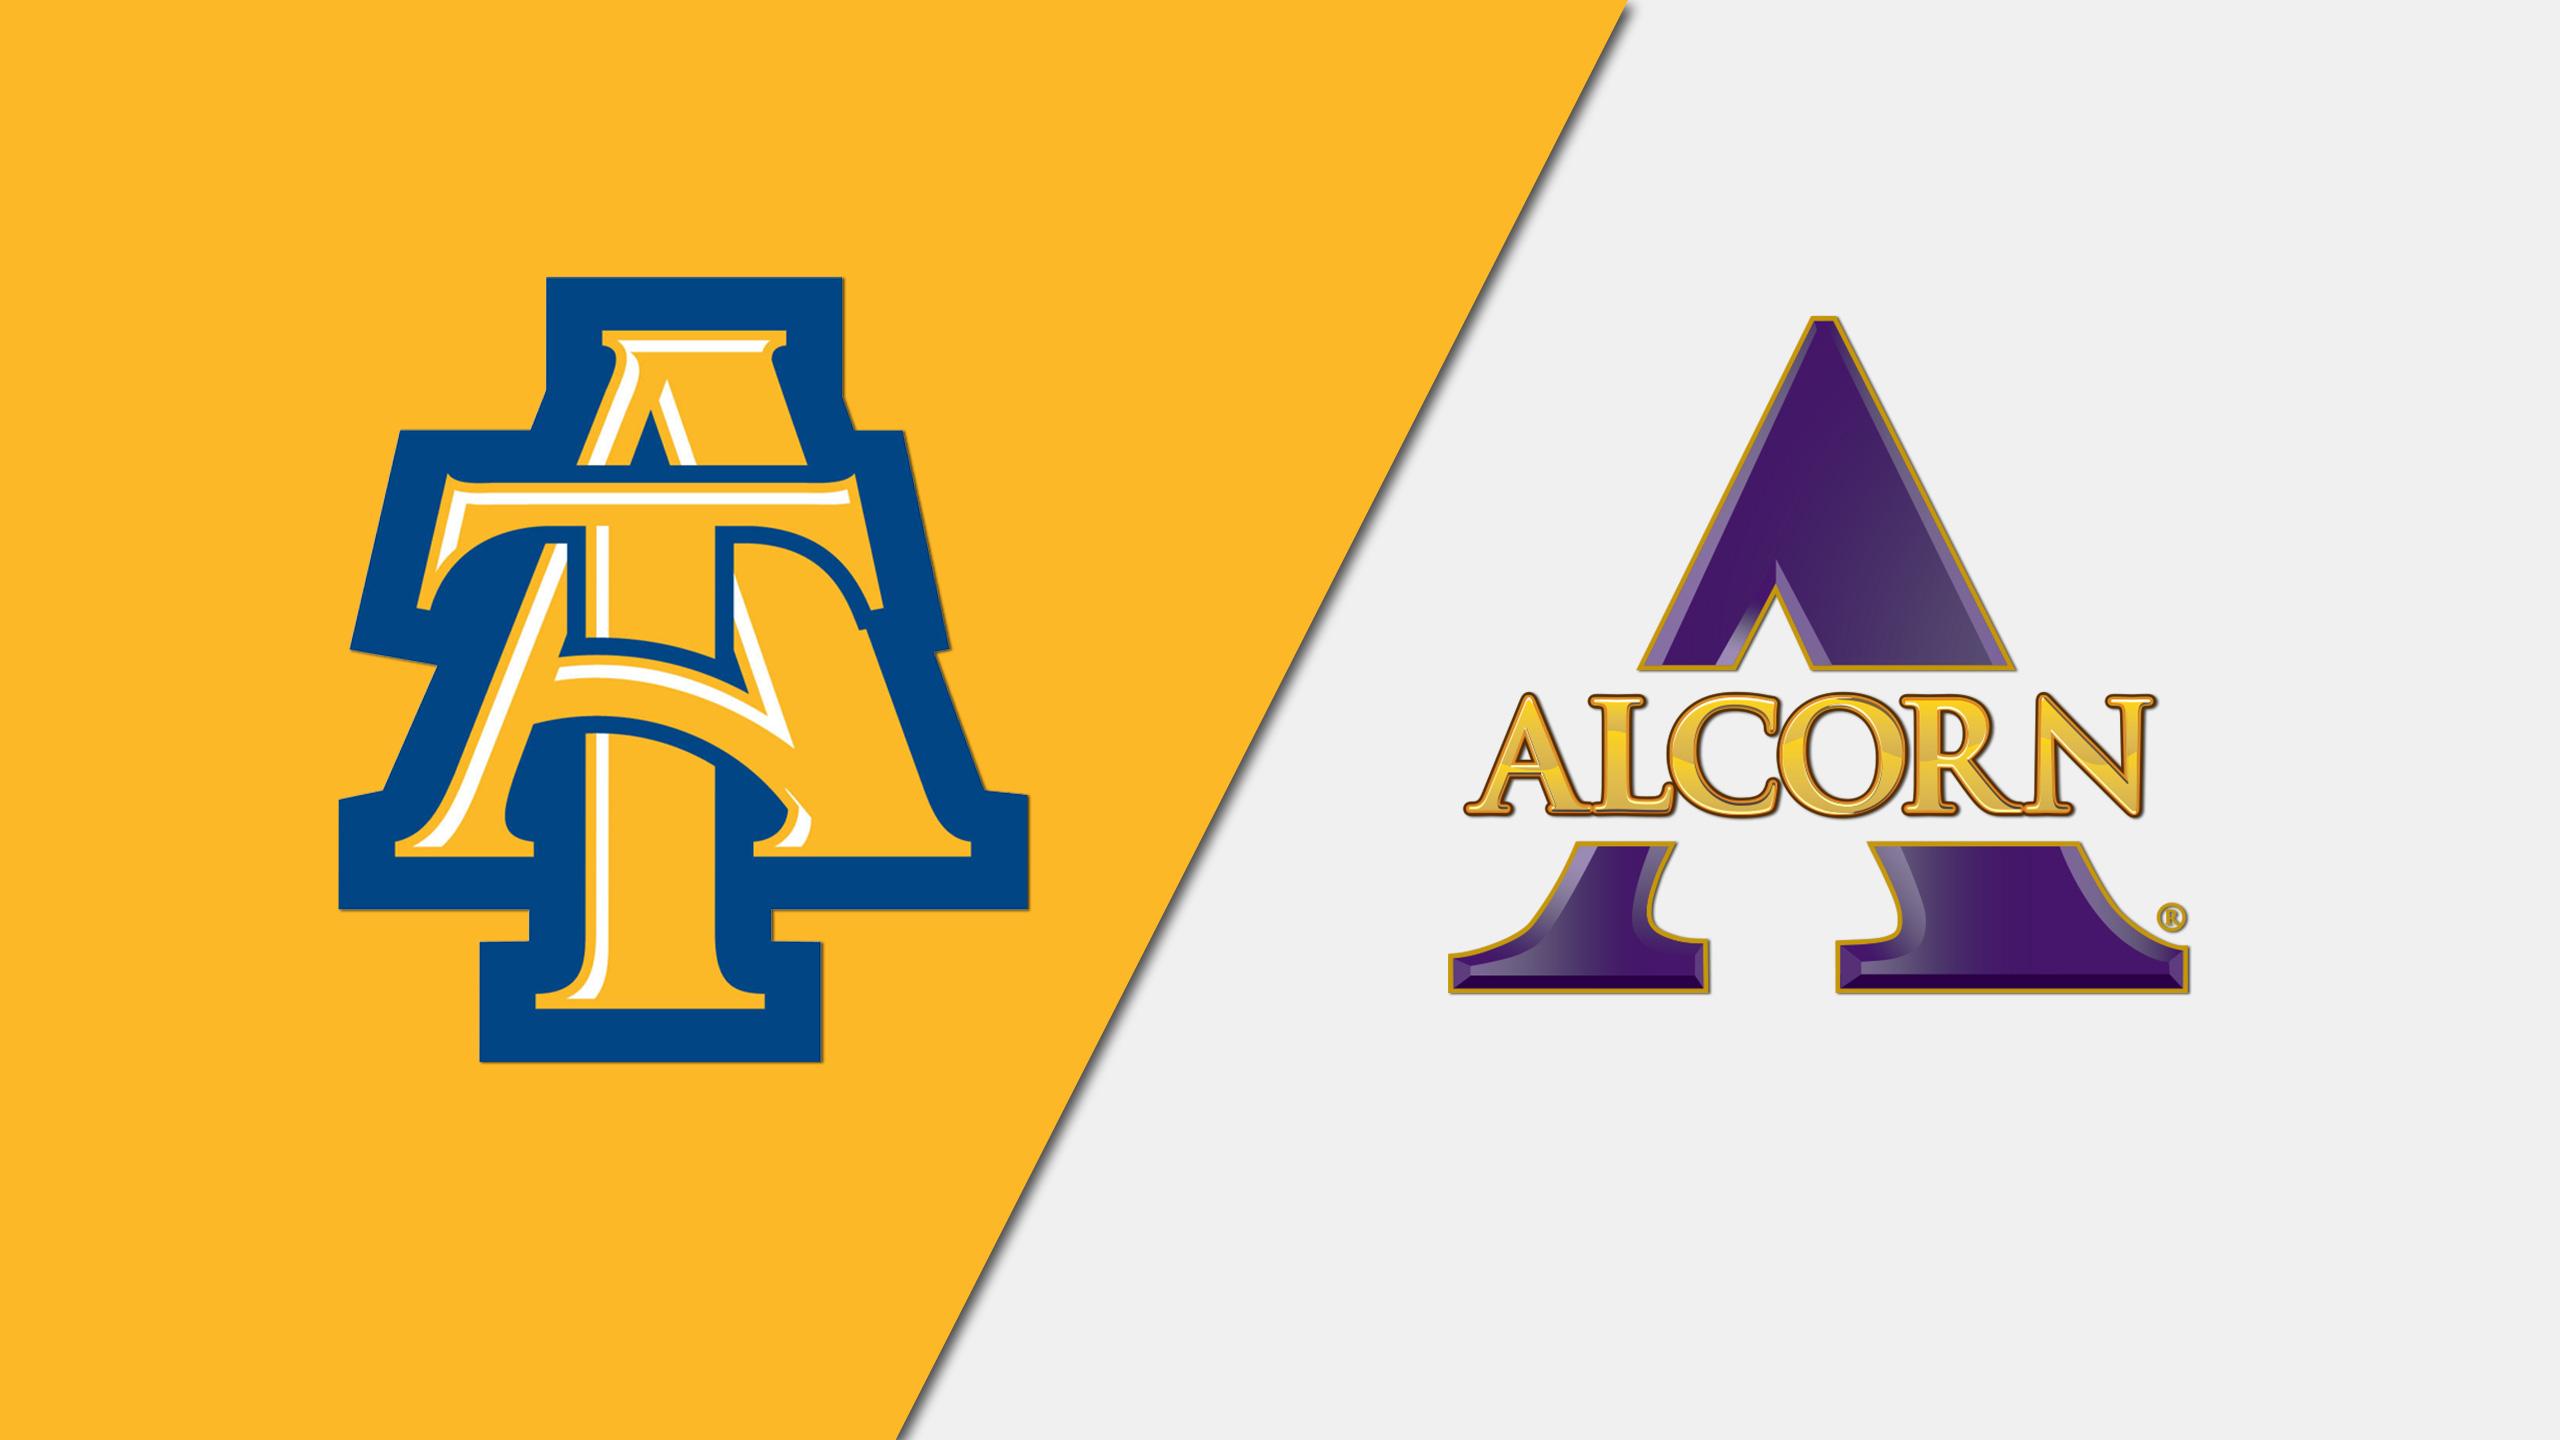 In Spanish - North Carolina A&T vs. Alcorn State (Air Force Reserve Celebration Bowl)